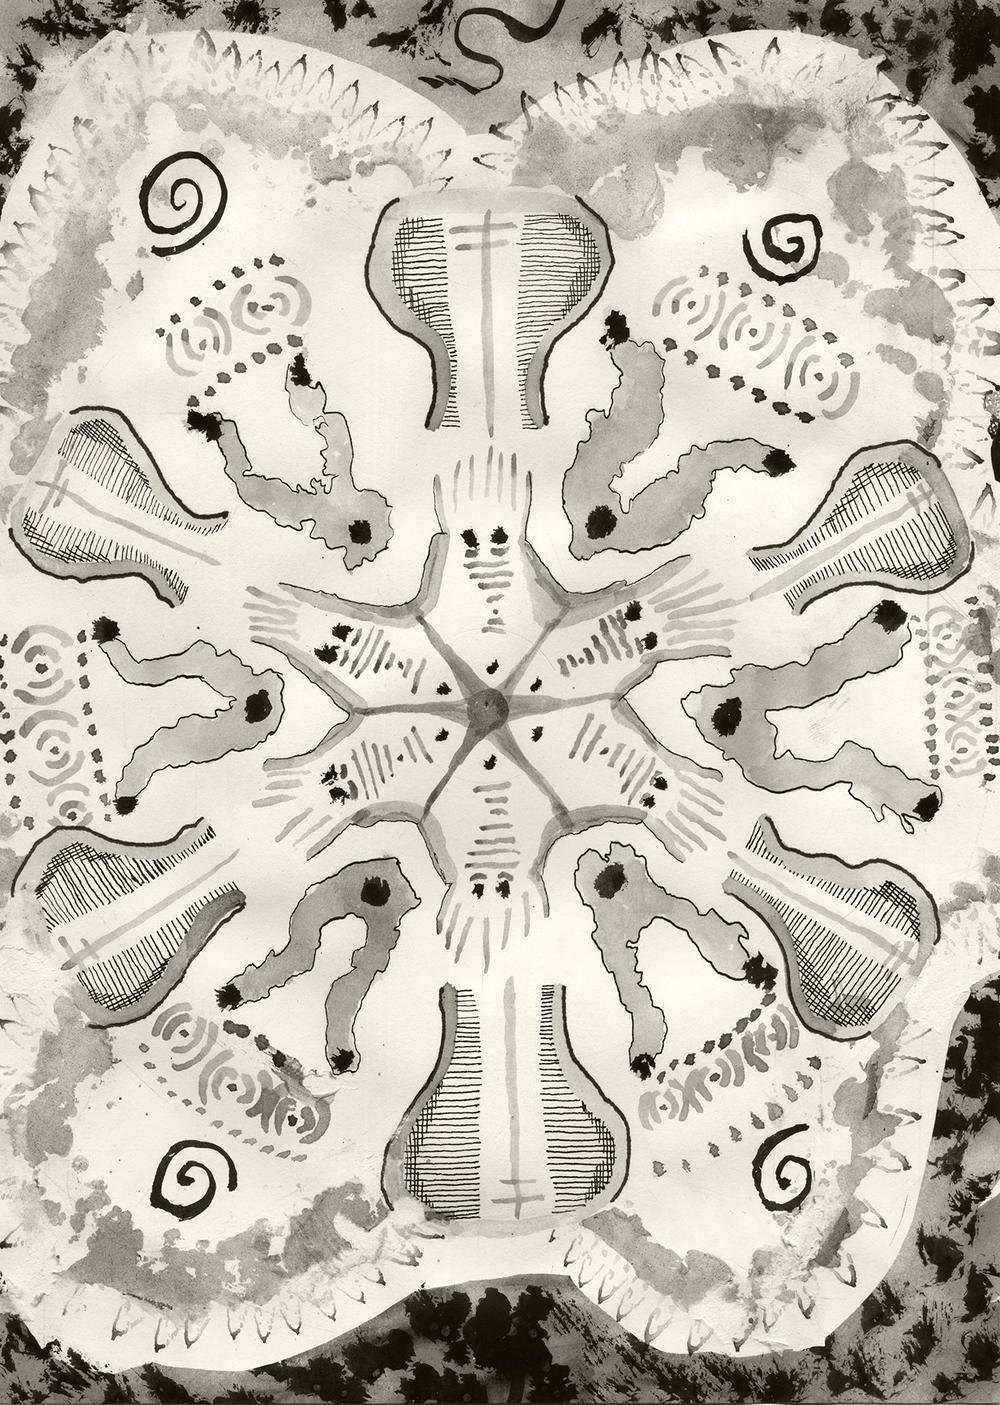 Organic radial symmetry